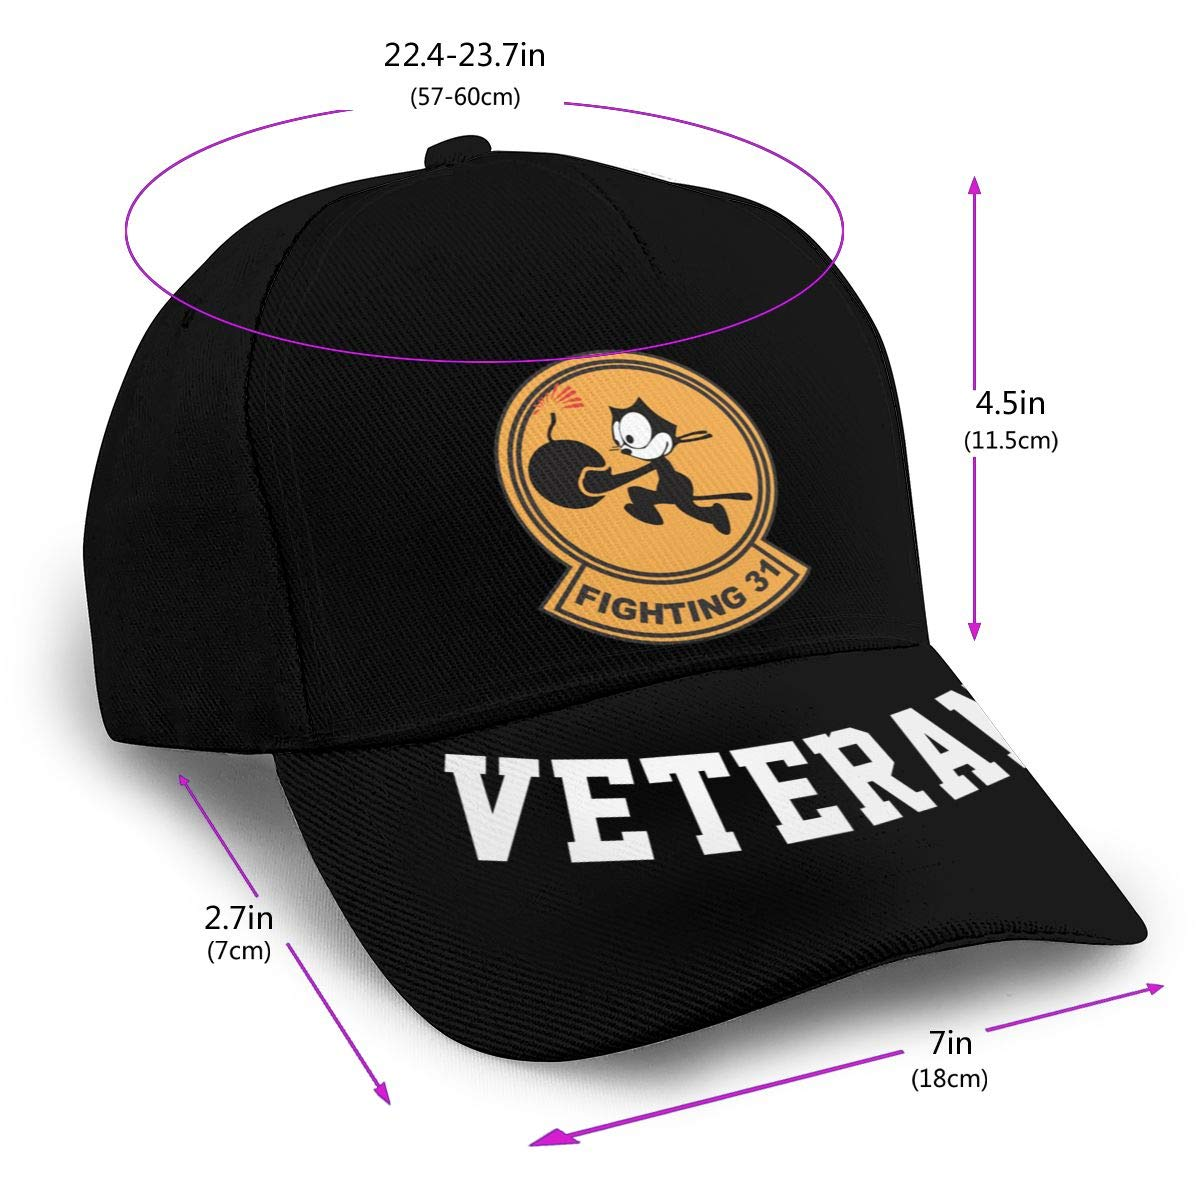 VF-31 Fighting Baseball Cap Dad Hat Unisex Classic Sports Hat Peaked Cap Veteran Hat